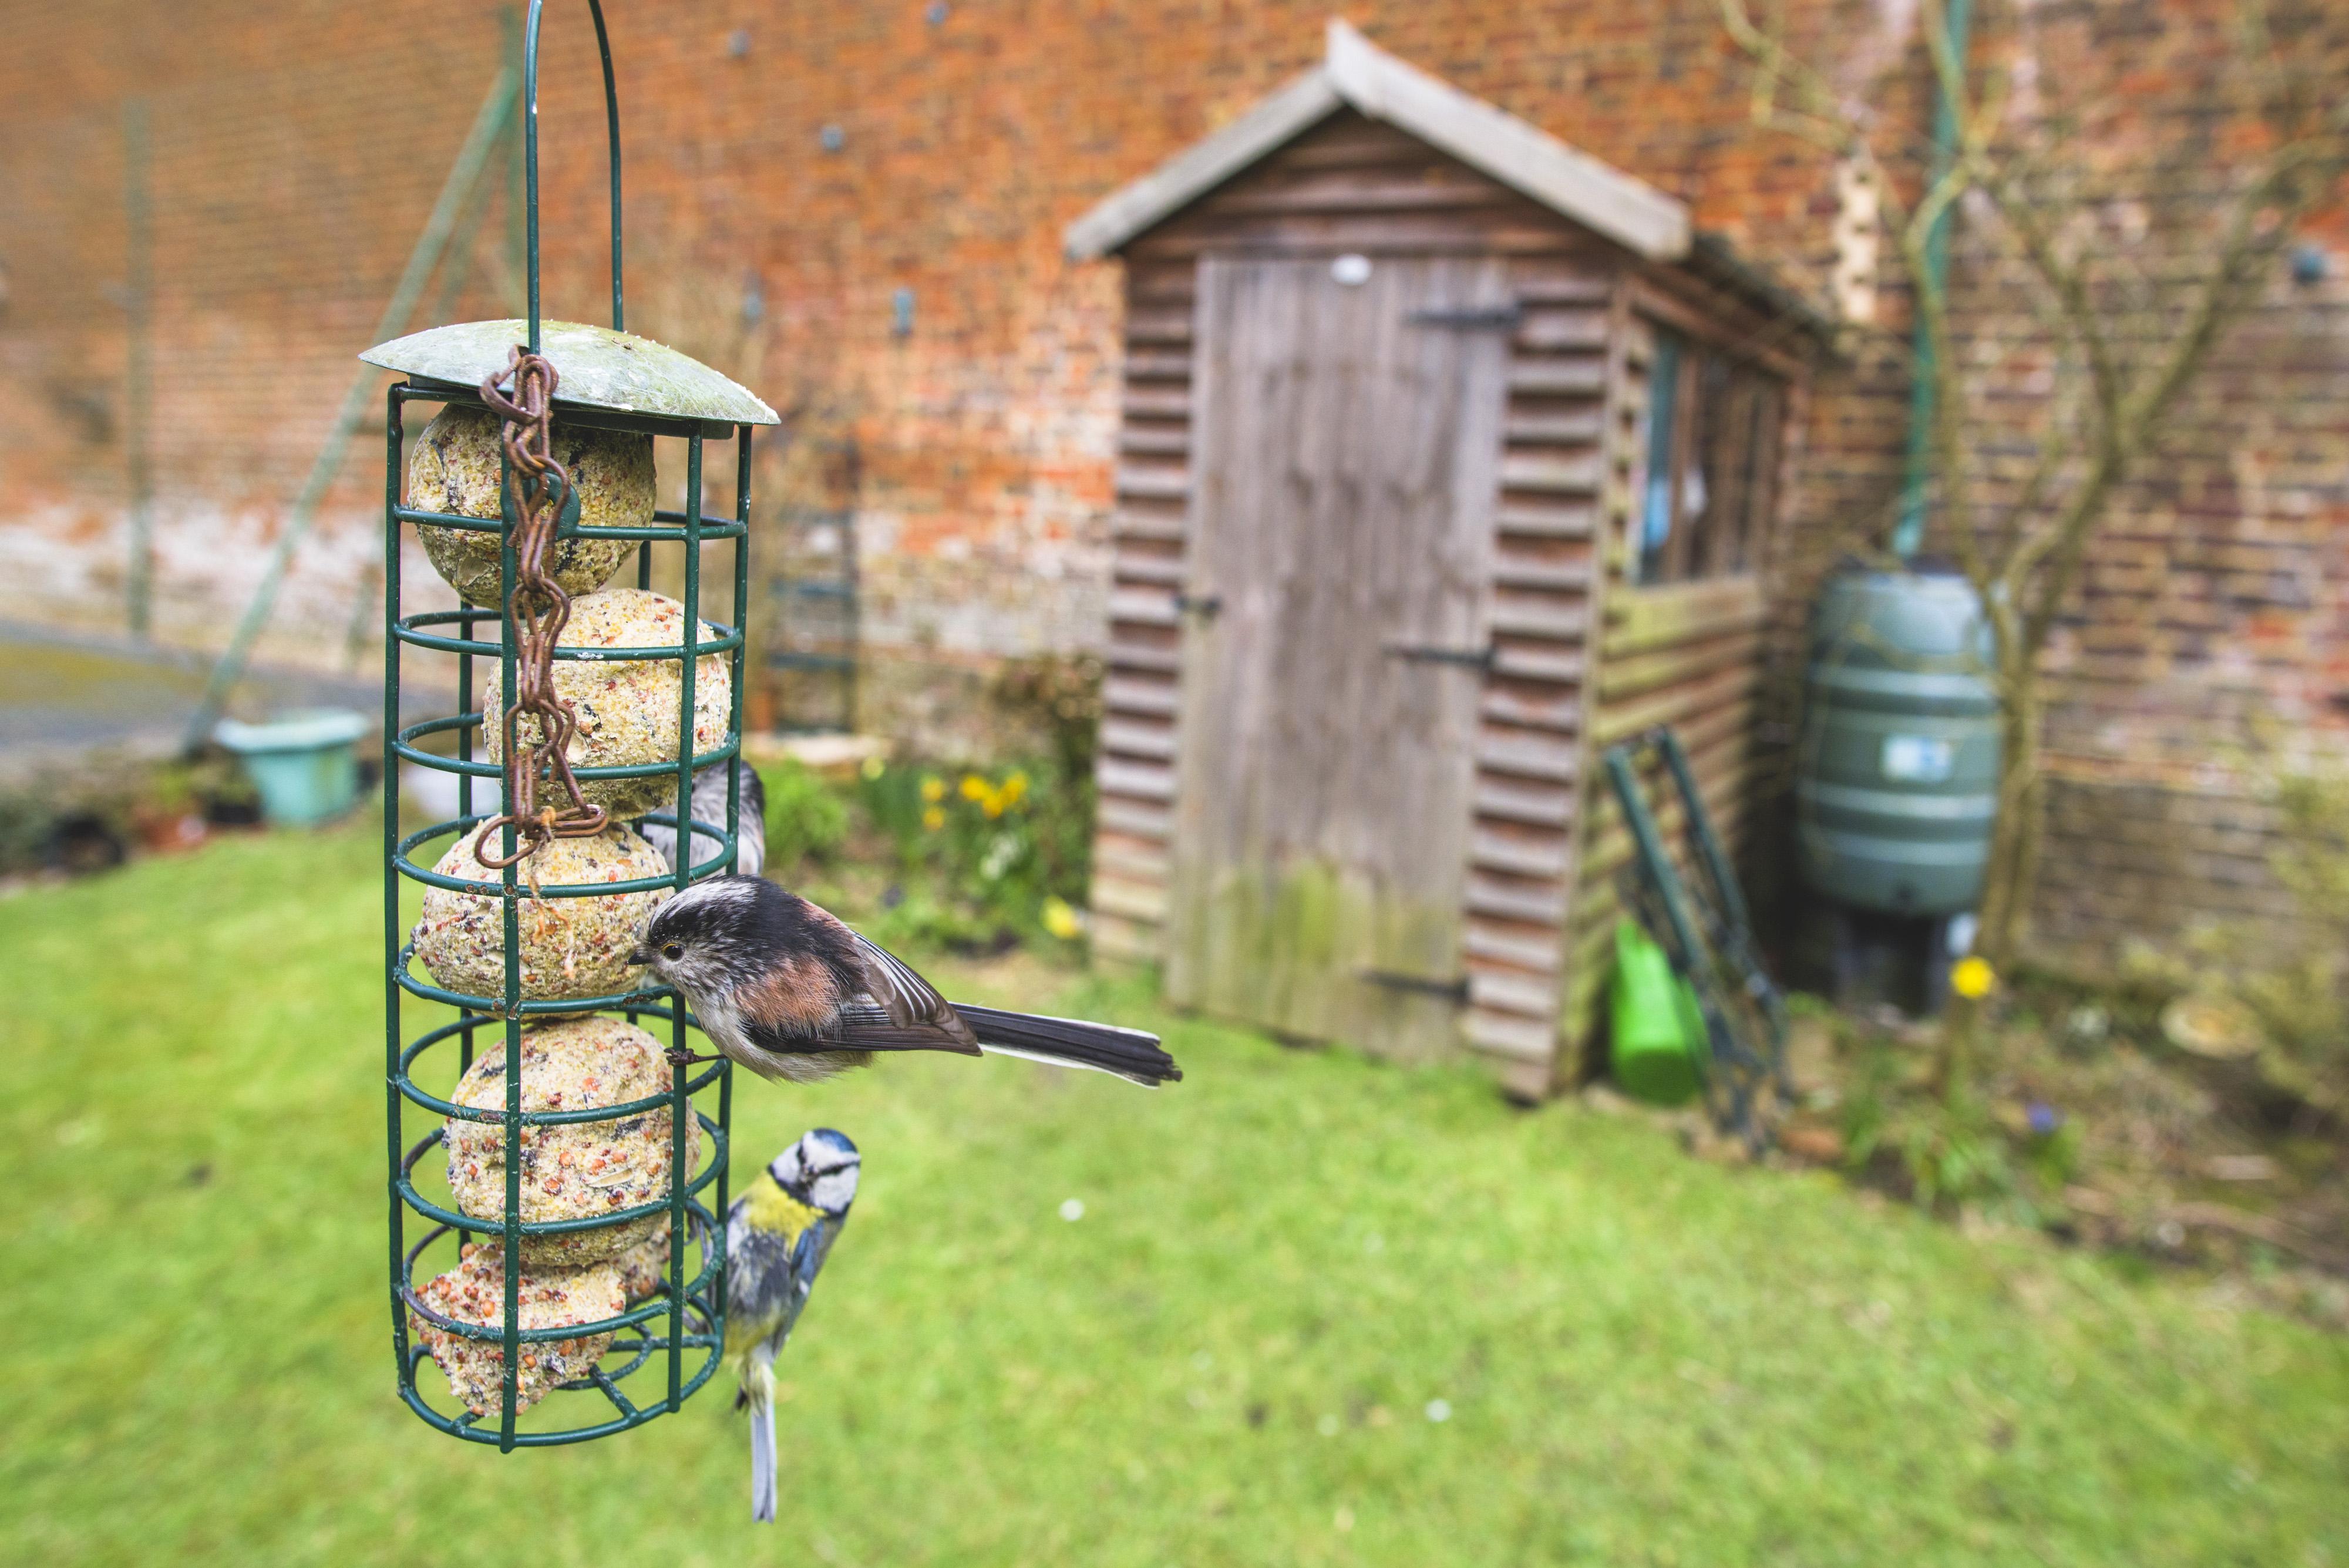 Bird and bird feeder in the garden